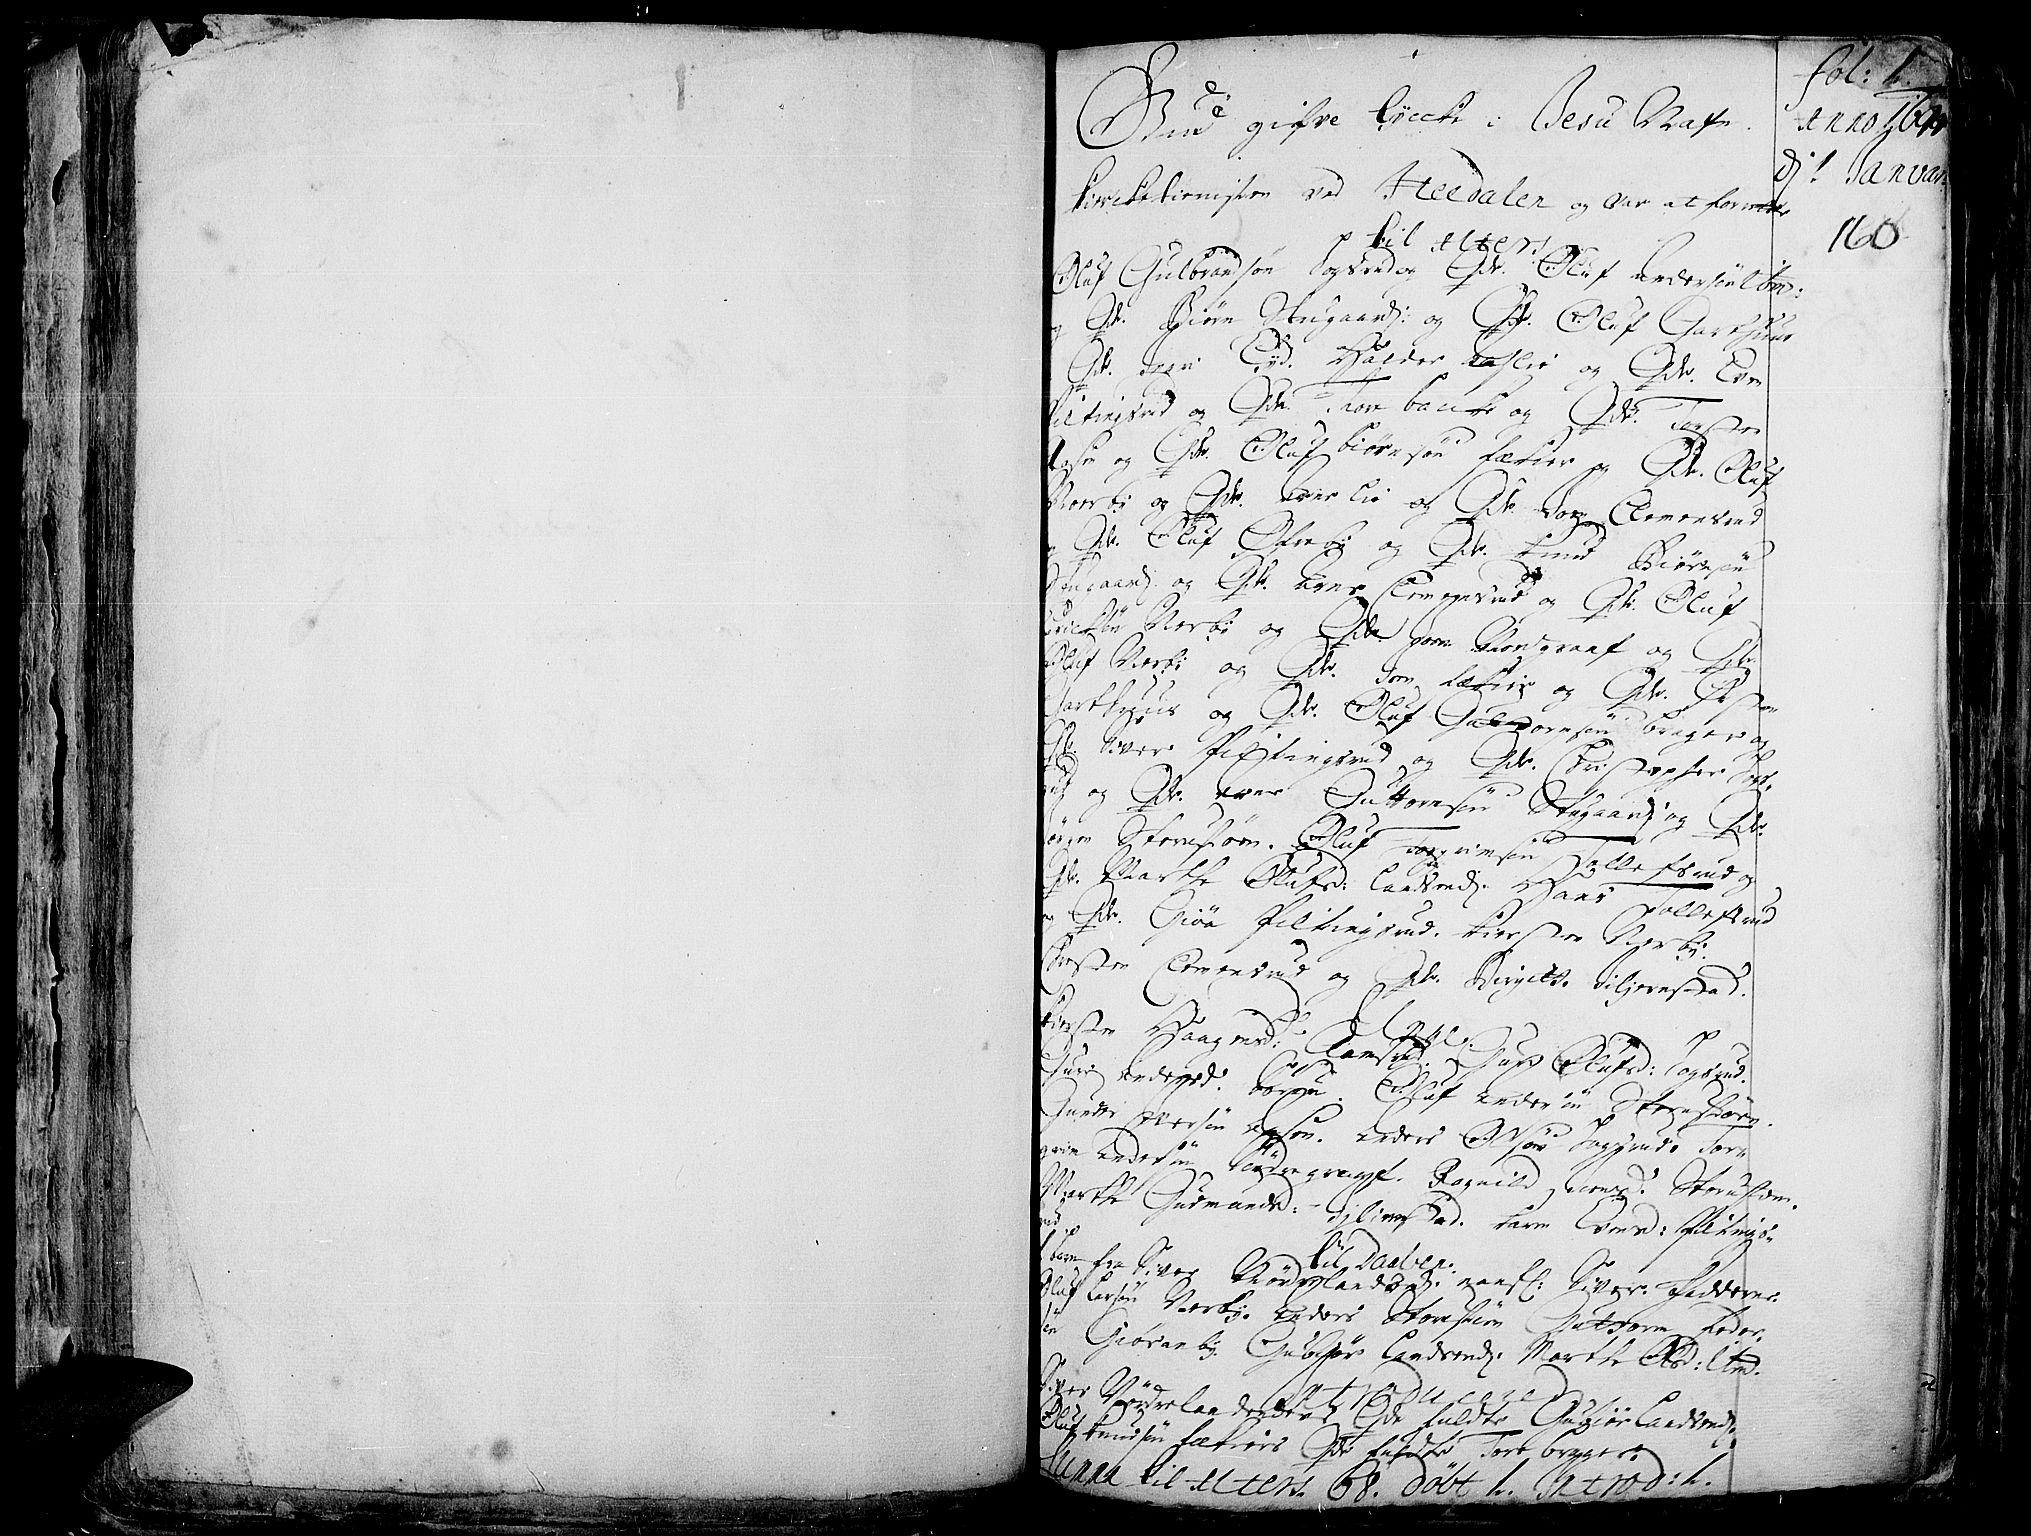 SAH, Aurdal prestekontor, Ministerialbok nr. 1-3, 1692-1730, s. 160